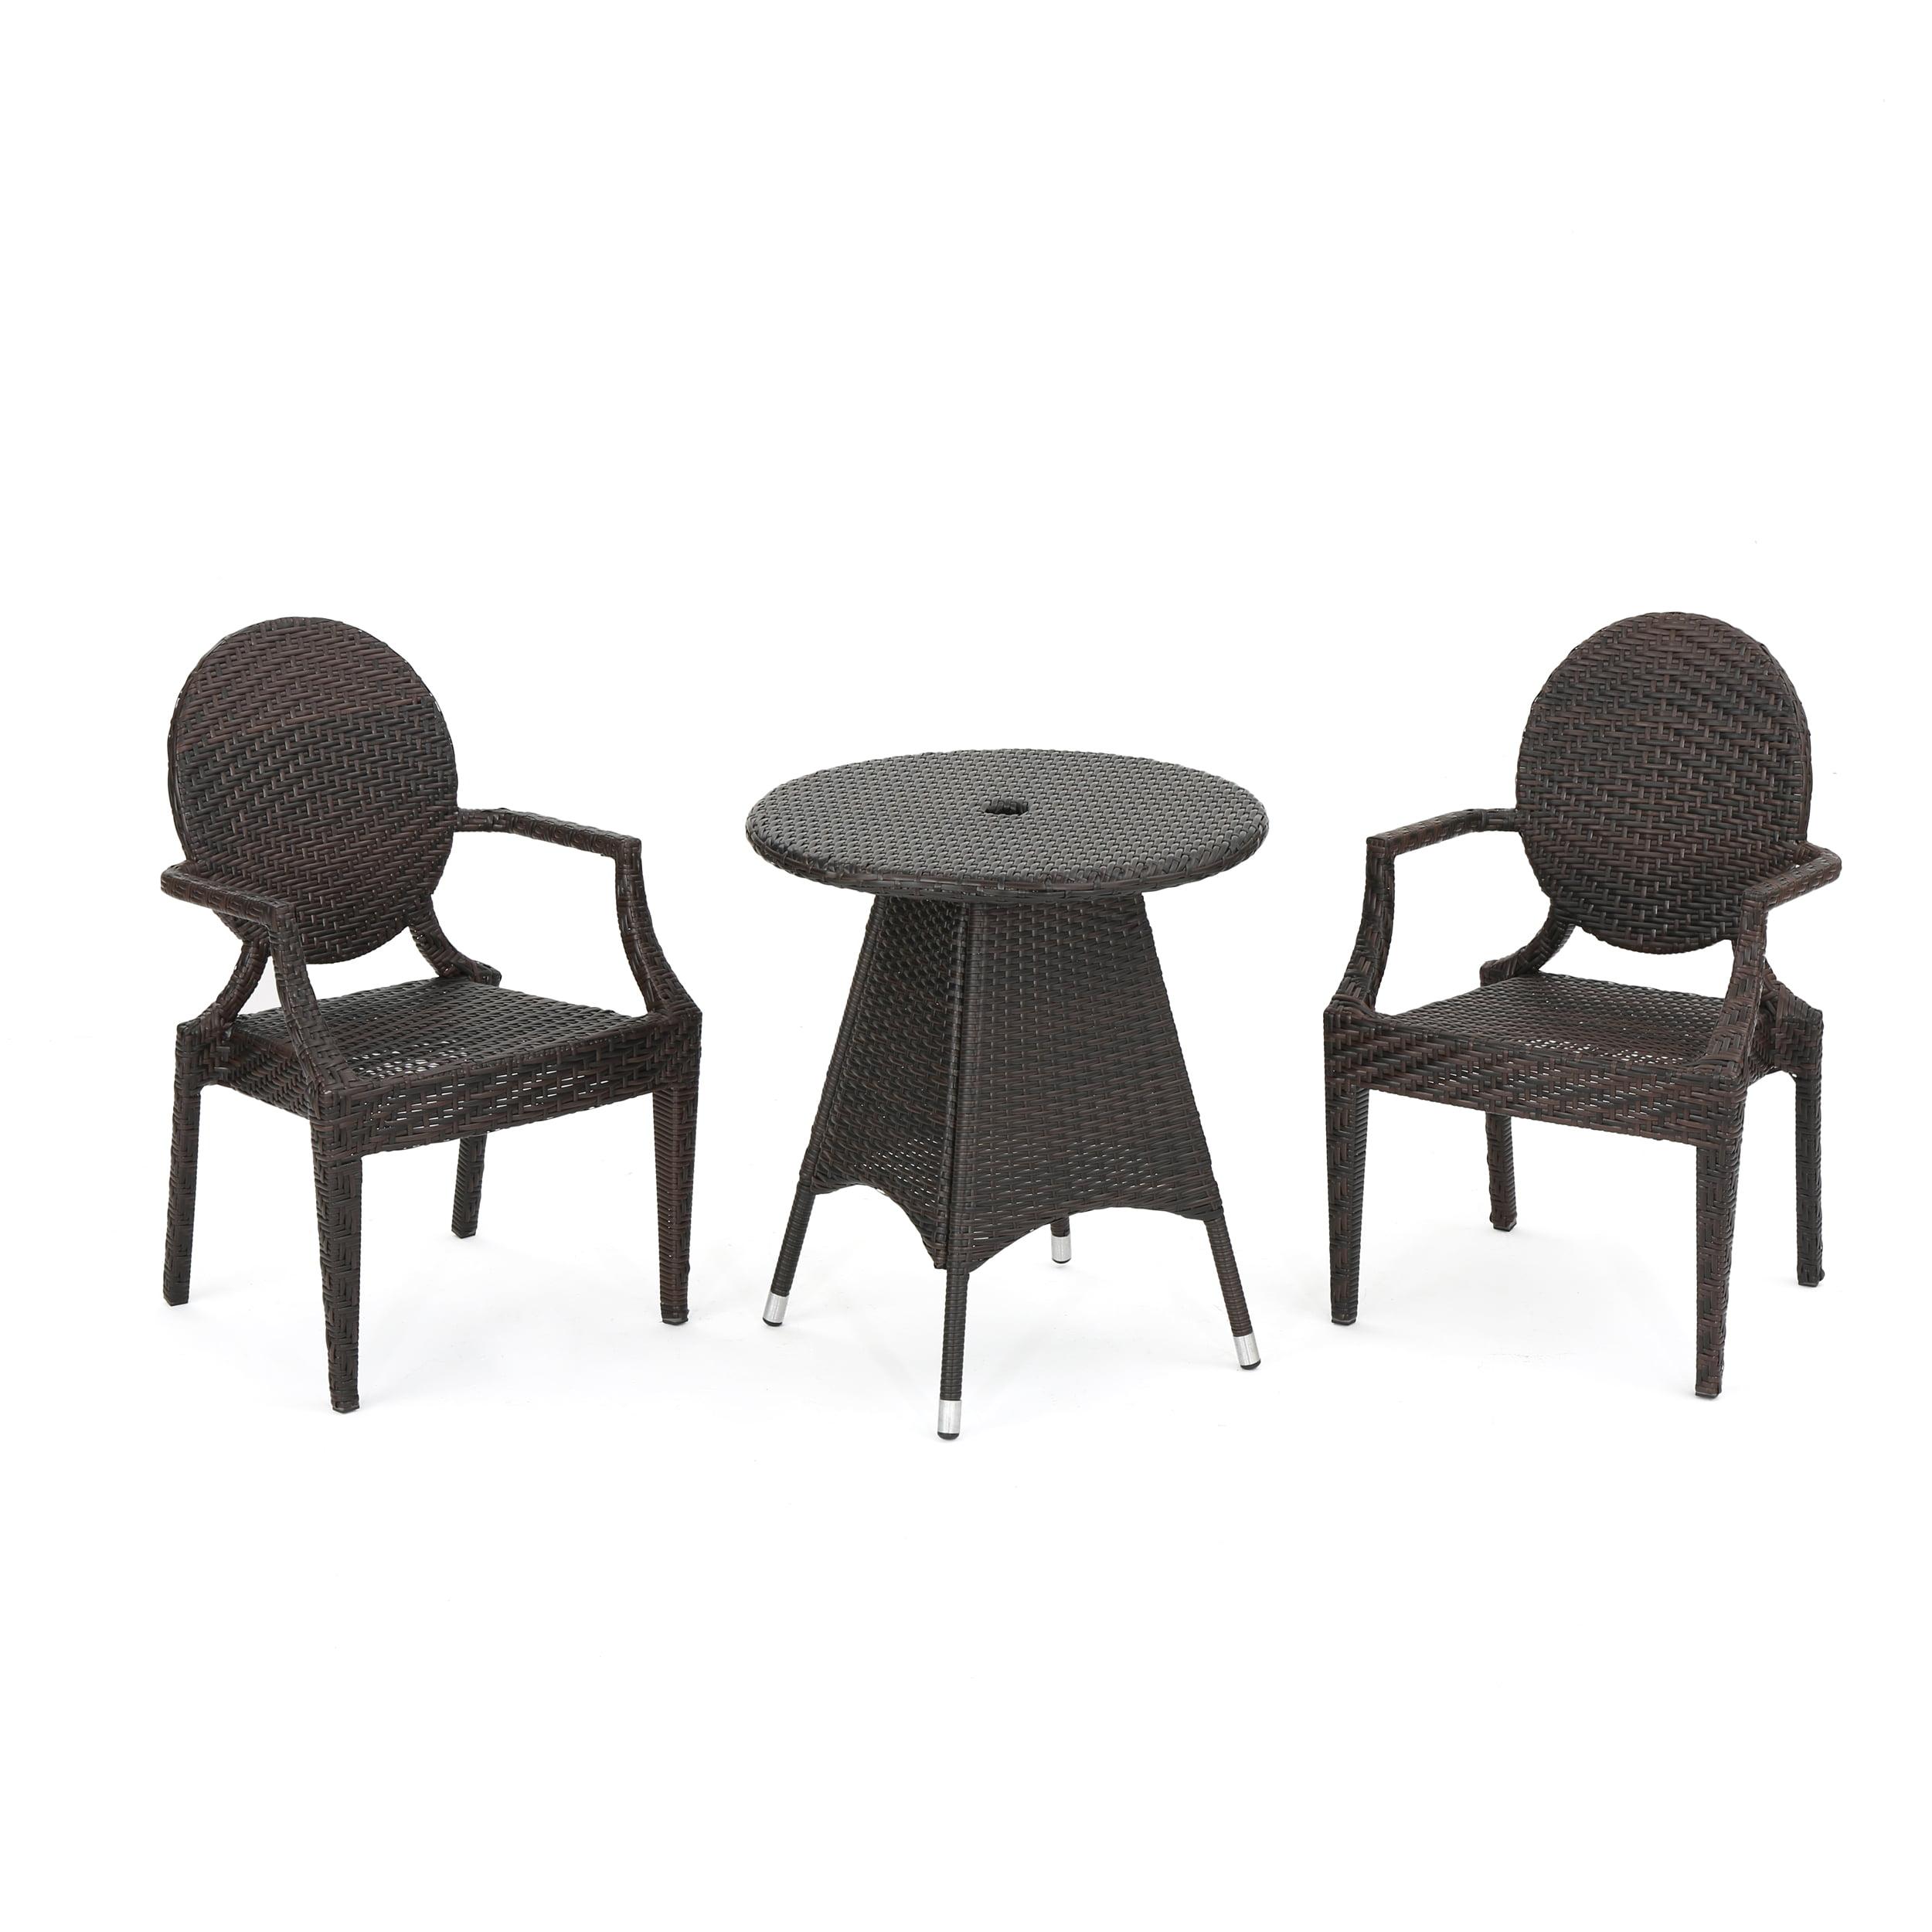 Demuir Outdoor 3-Piece Wicker Dining Set, Multibrown